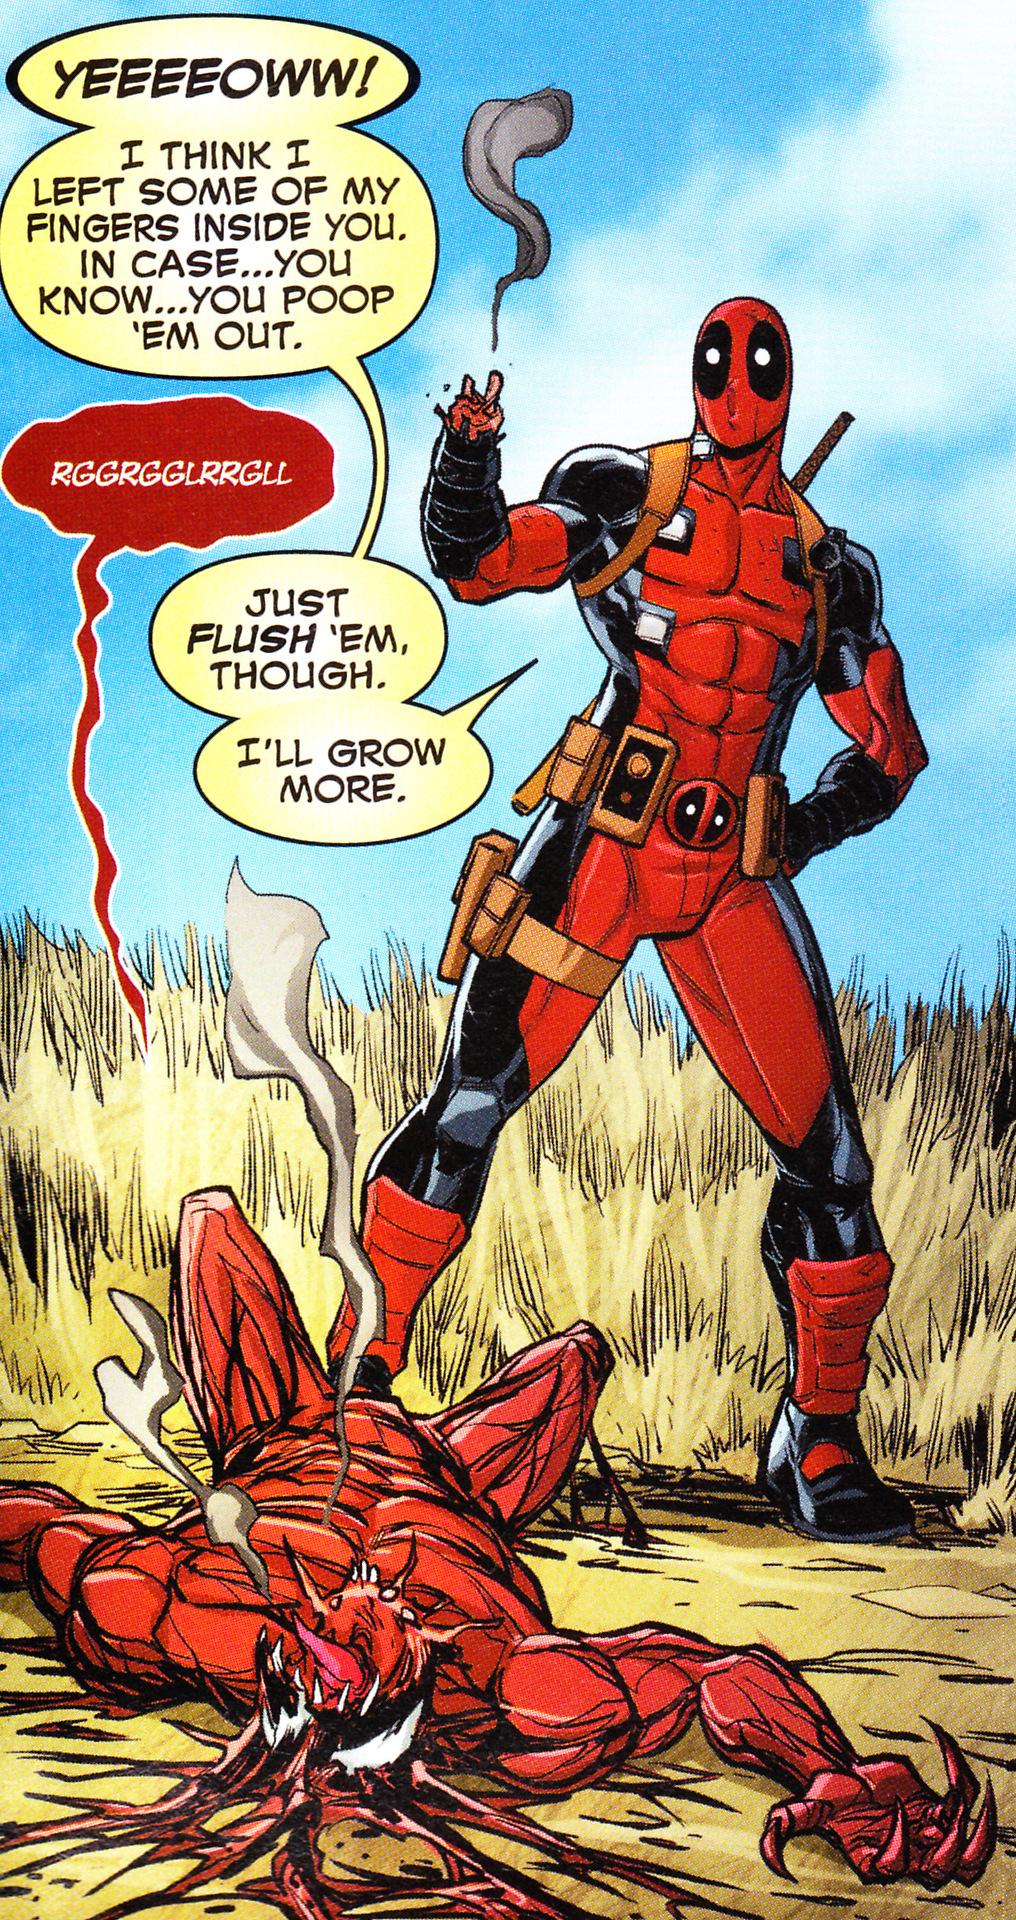 Deadpool Vs Carnage 1 Review Gonnageek Geek Podcasts Tech